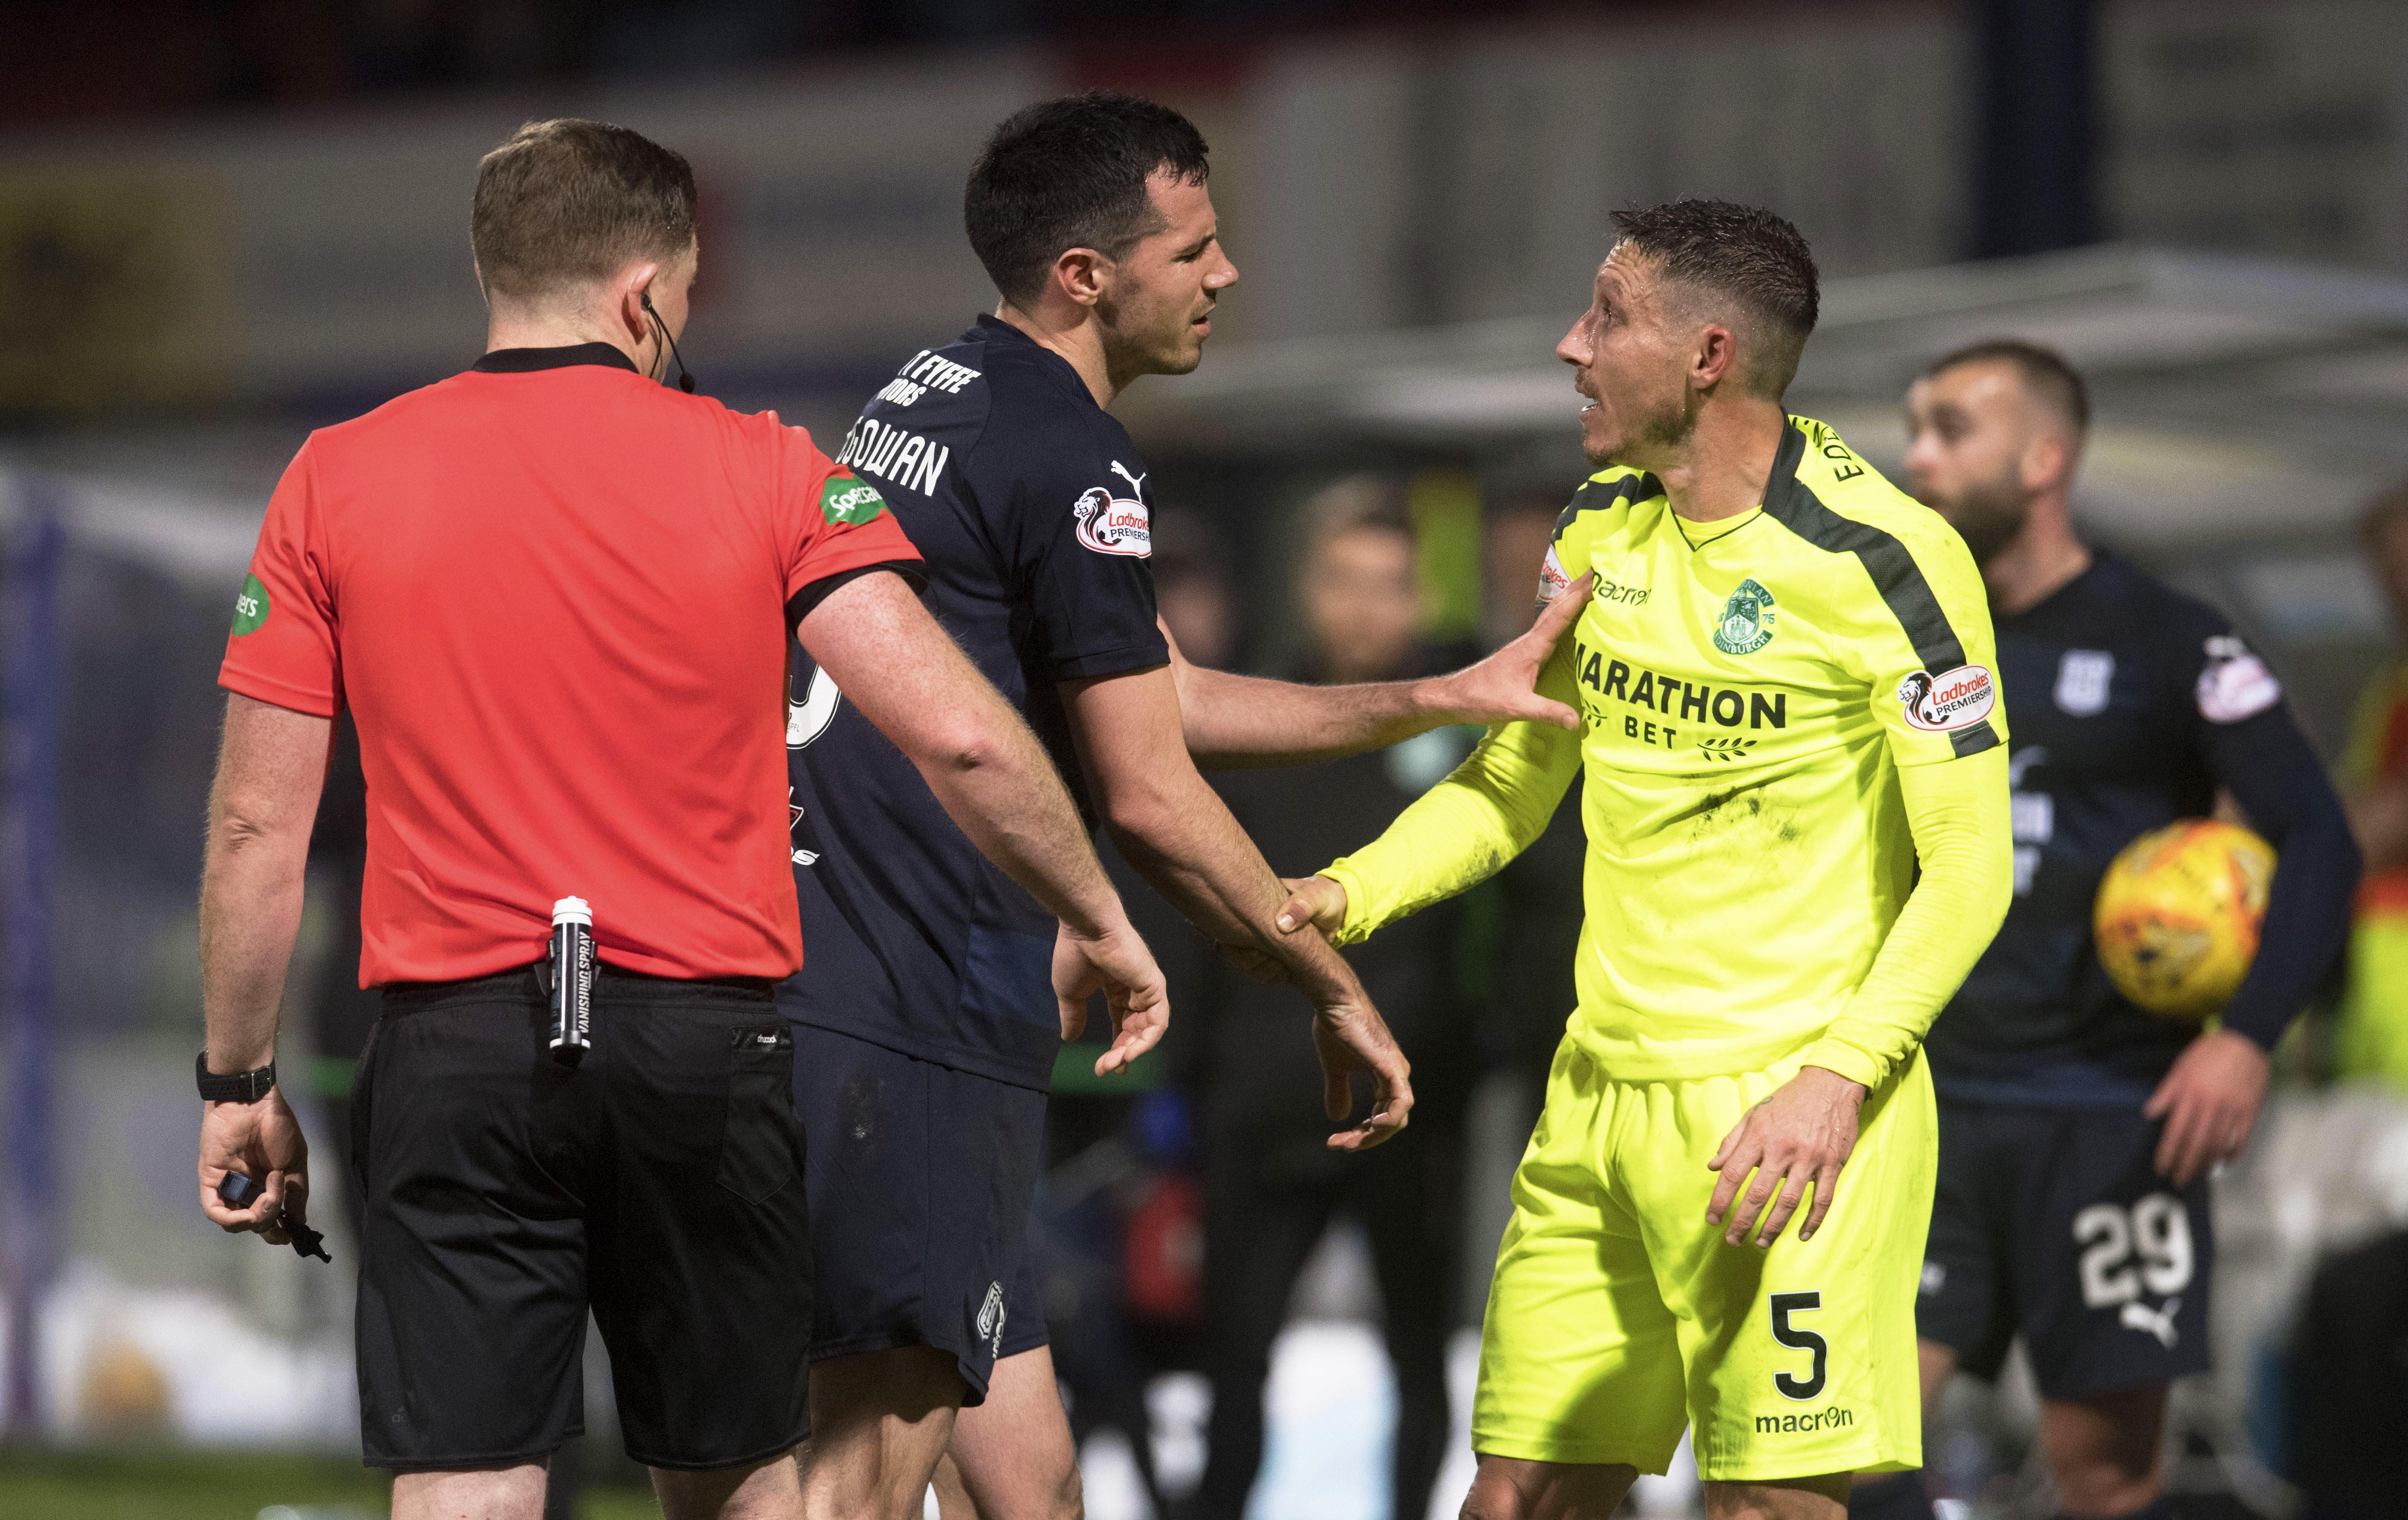 Dundee's Ryan McGowan exchanges words with Hibernian's Mark Milligan.